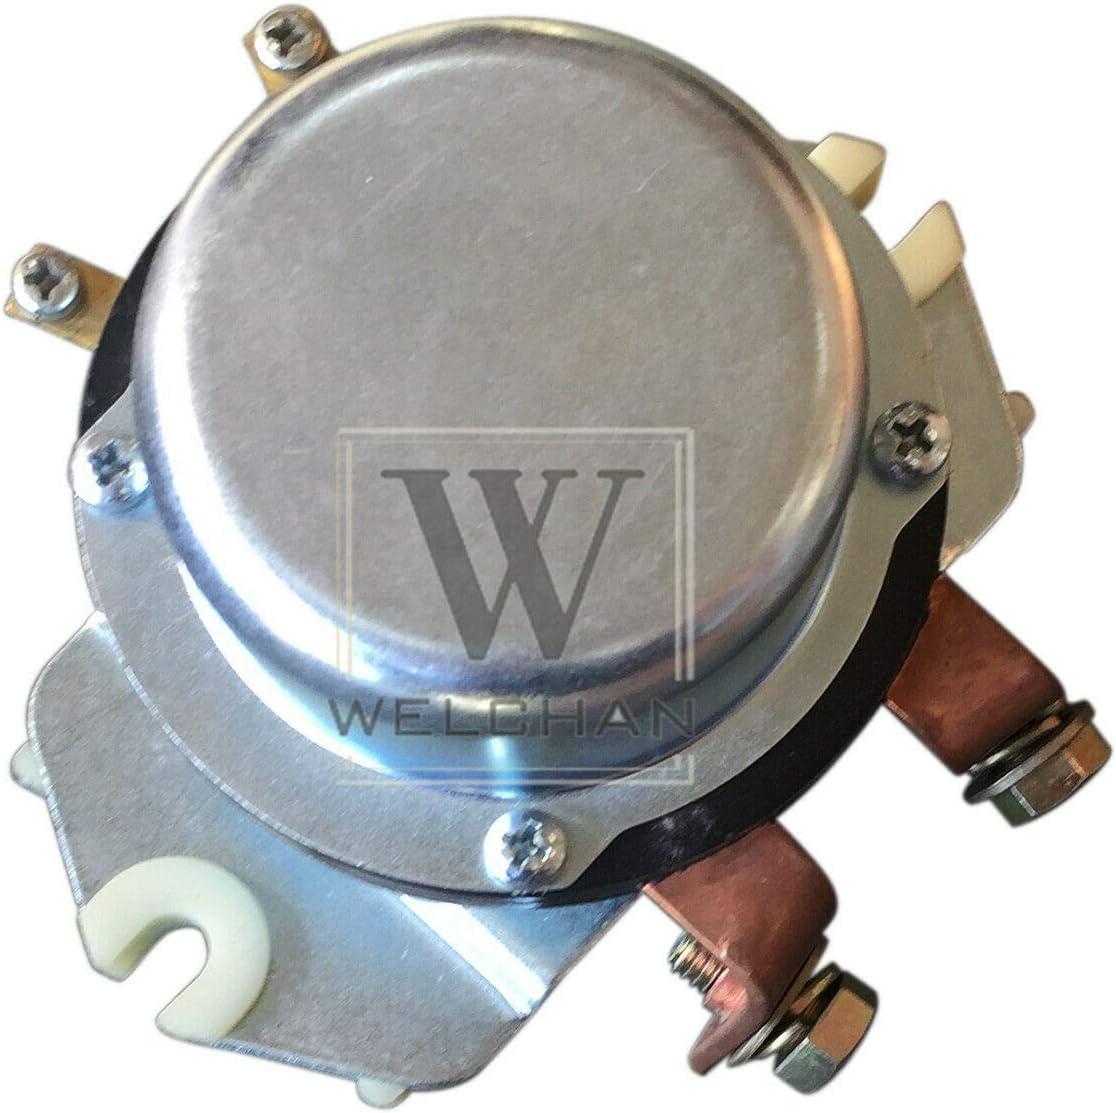 24V Battery Relay 21E5-0003 140622124 For Excavator R210-7 R210-9 R250-9